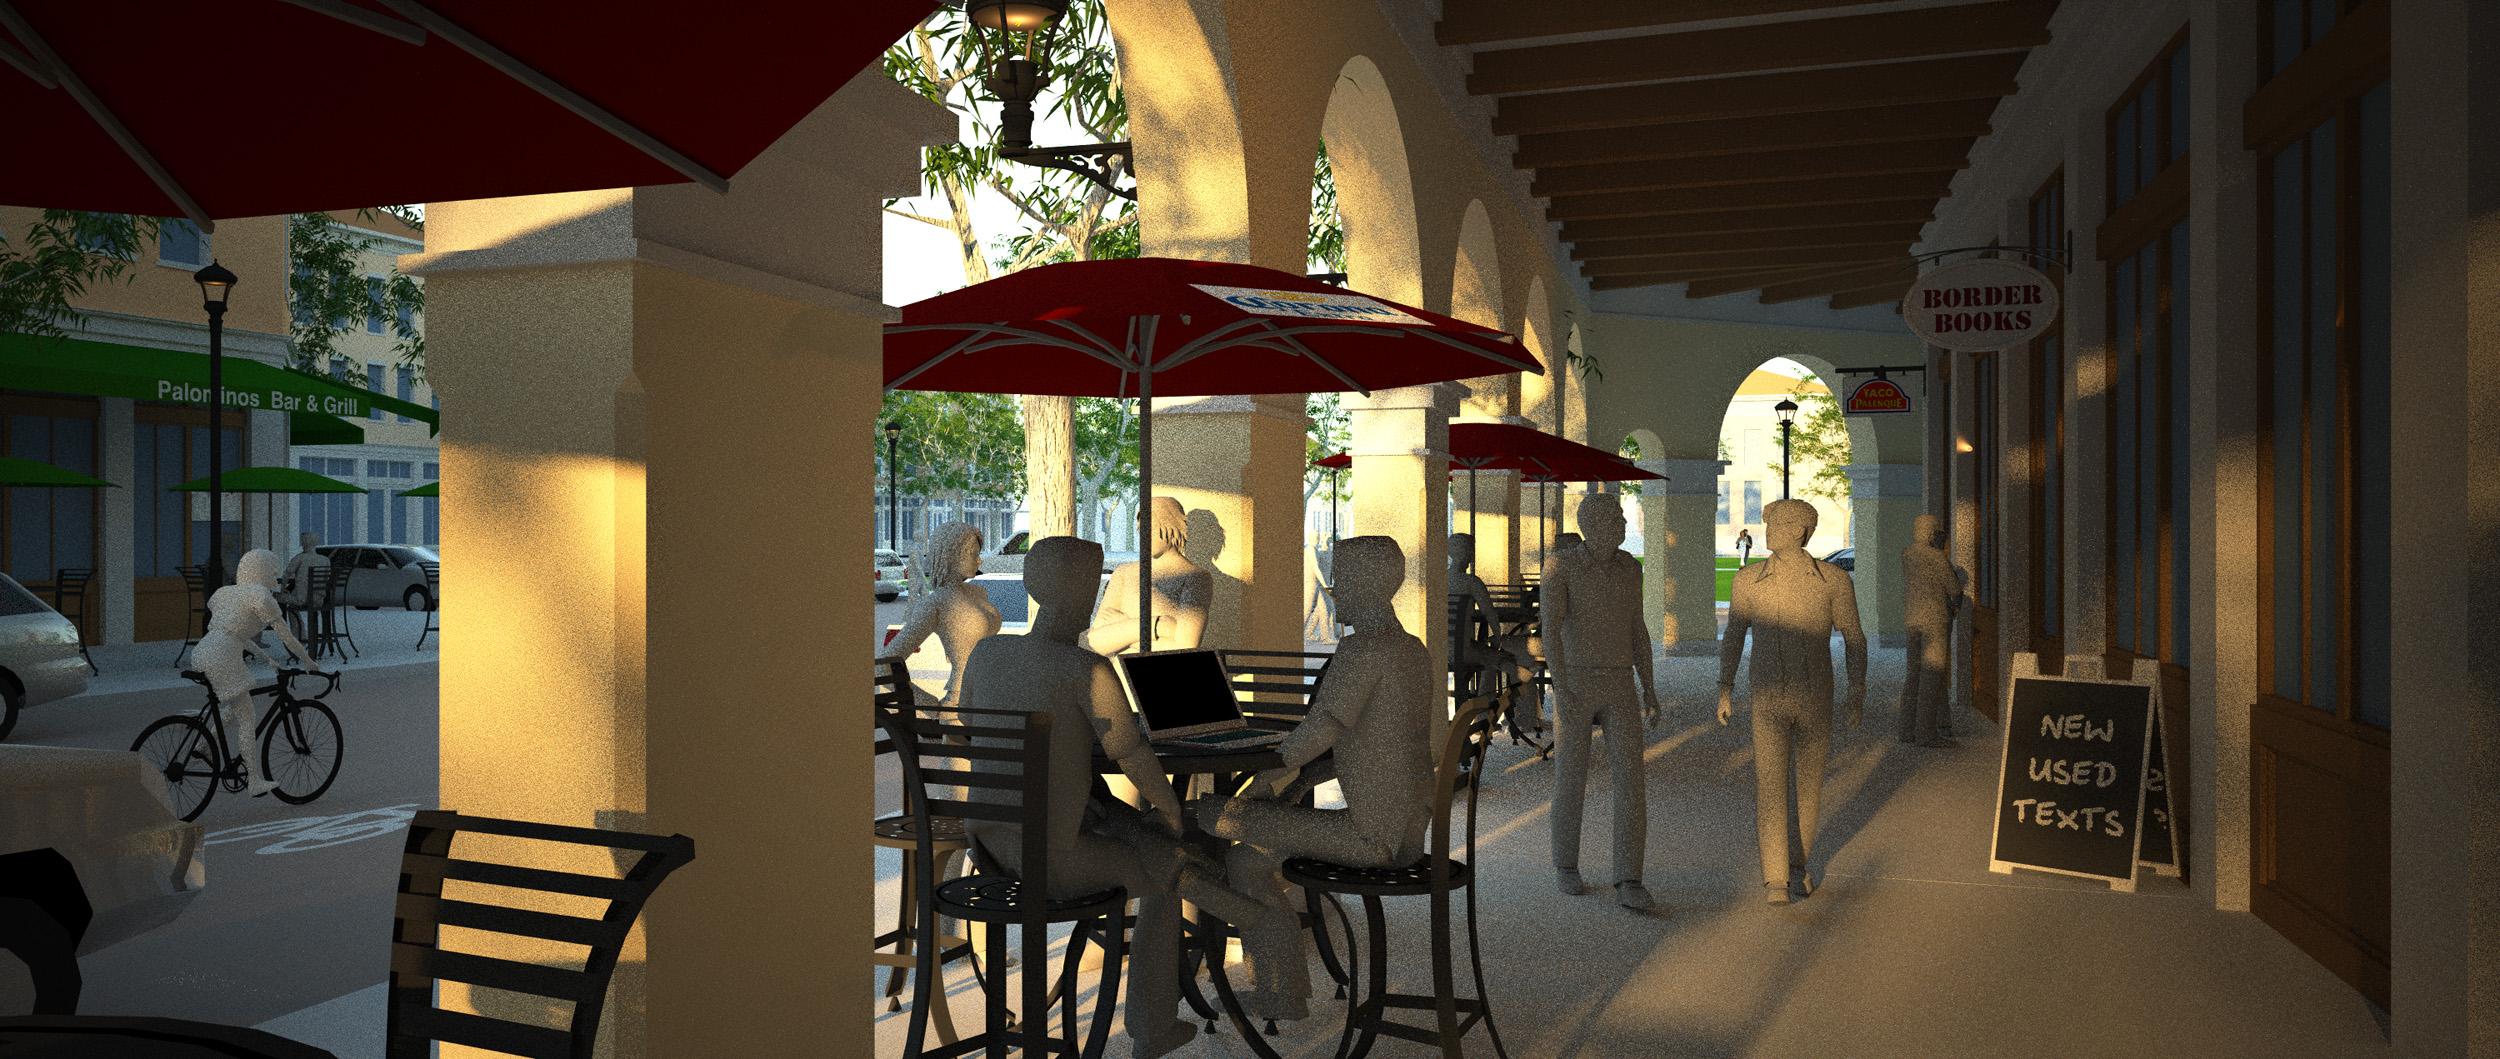 Laredo_LCC South - colonnade.jpg